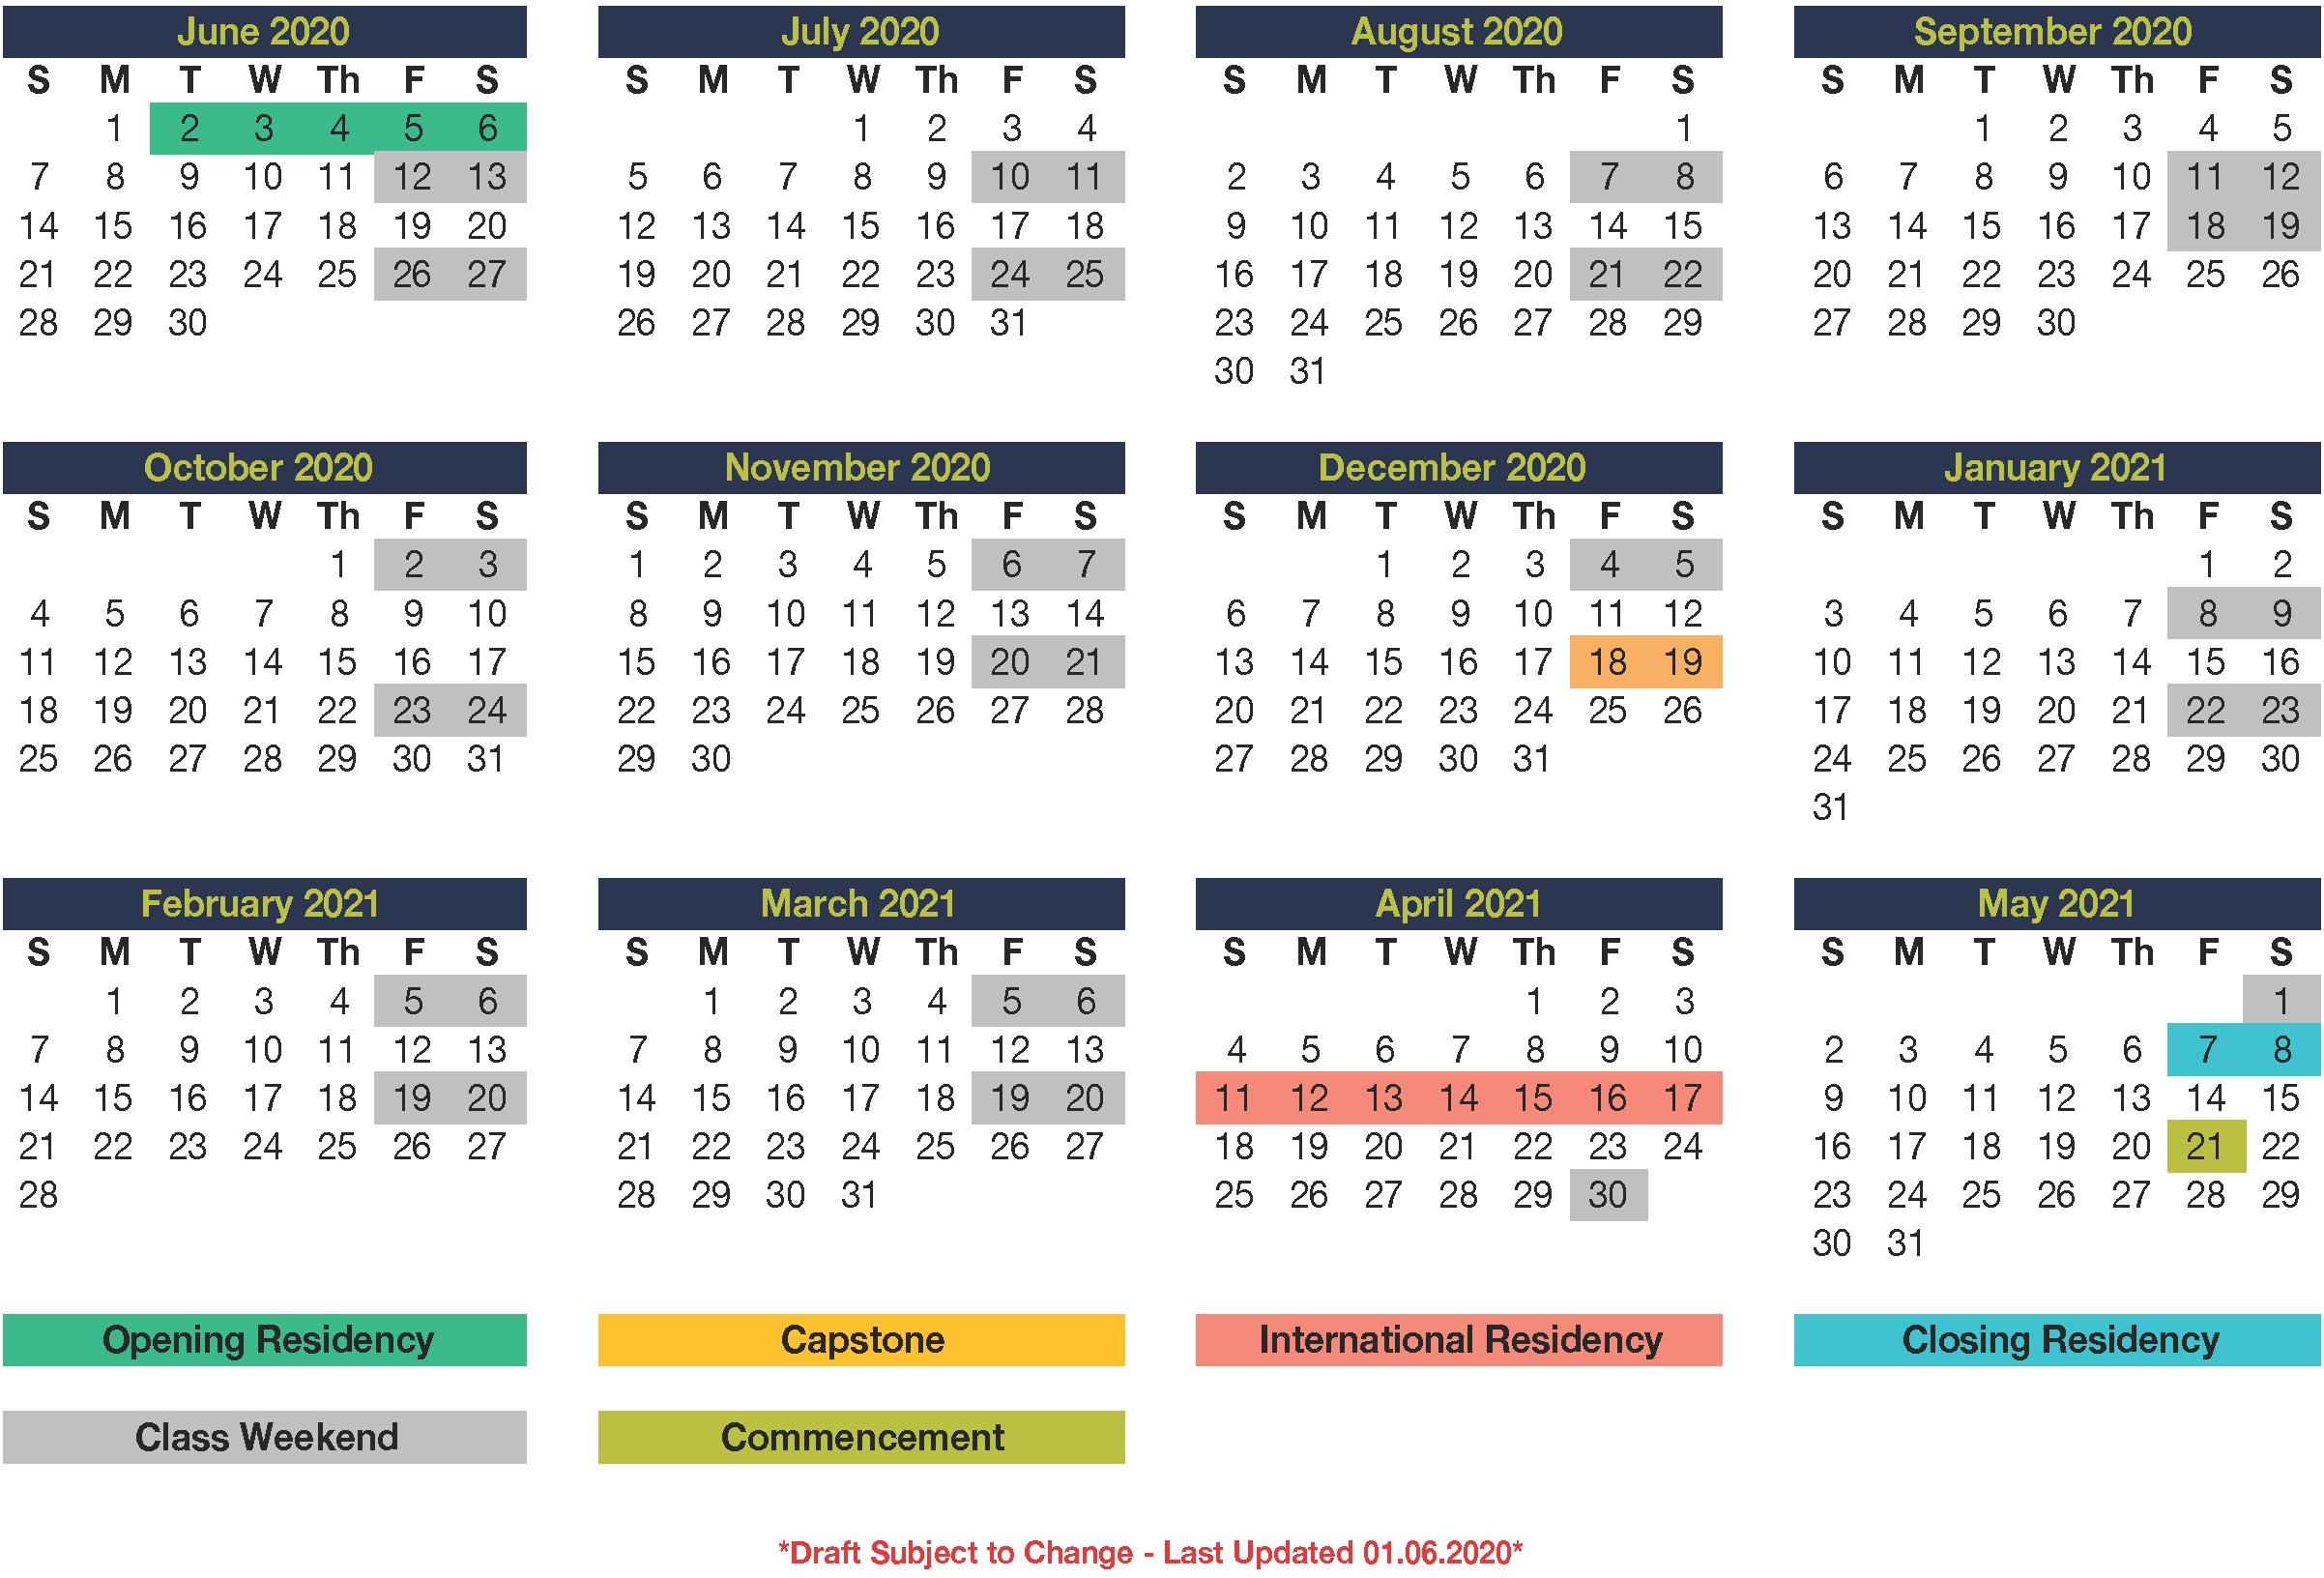 Eml-16-Program-Calendar-2020-2021 | Mcdonough School Of